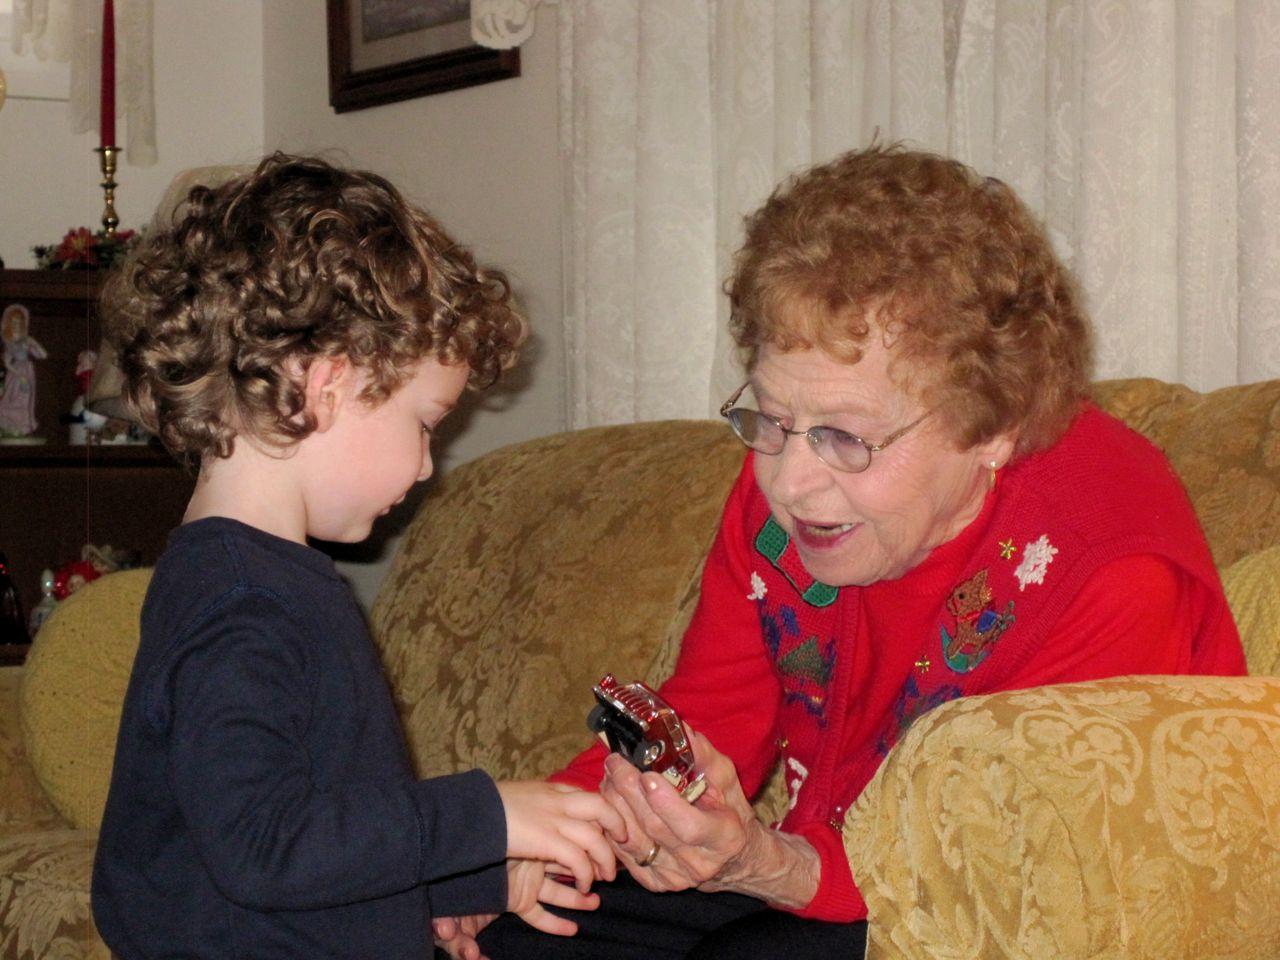 Wordless Wednesday: Sweet Memories With Great Grandma